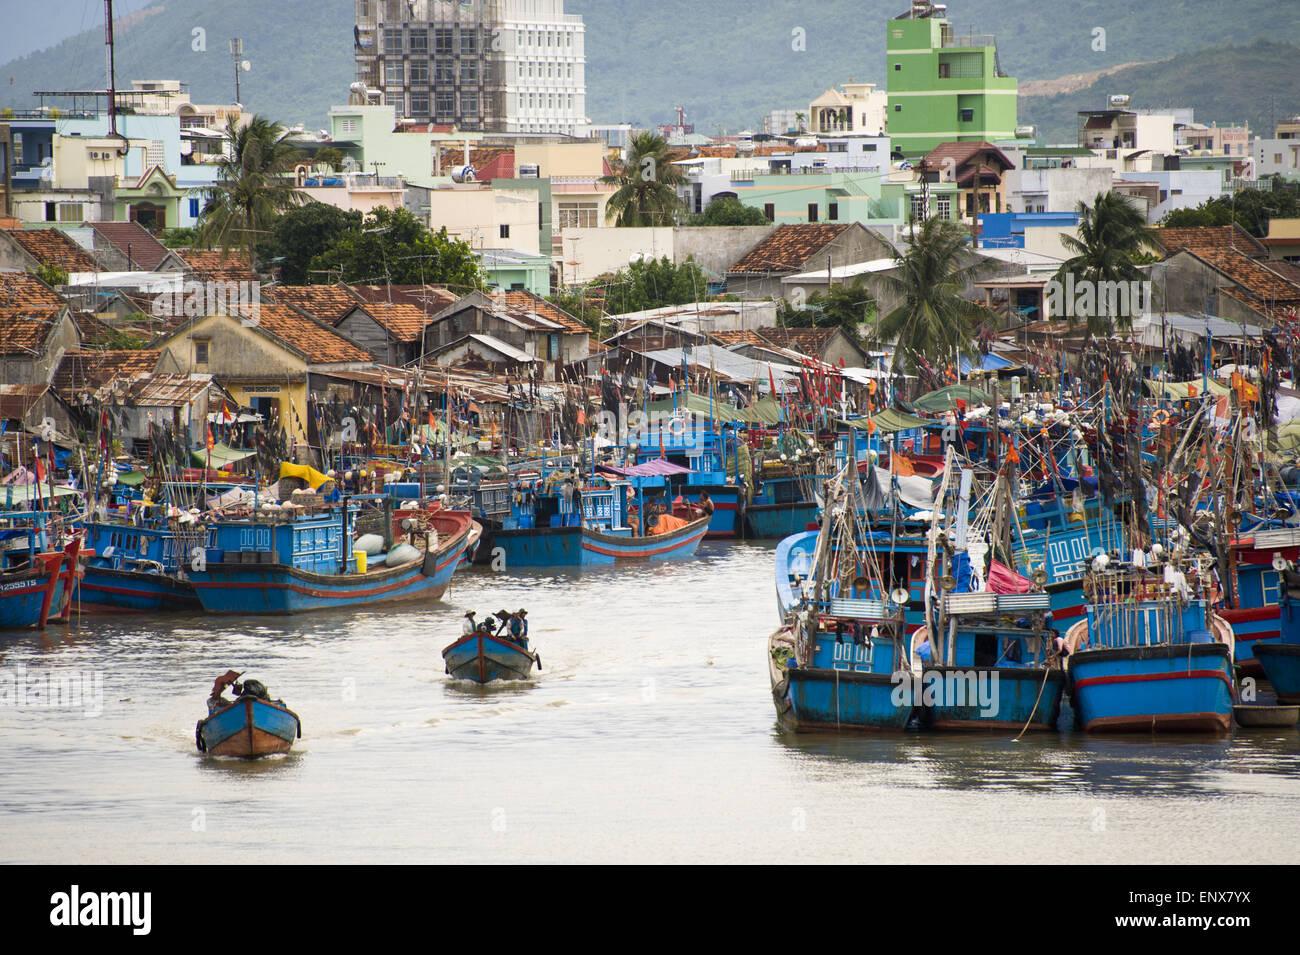 Harbour - Nha Tranf, Vietnam - Stock Image